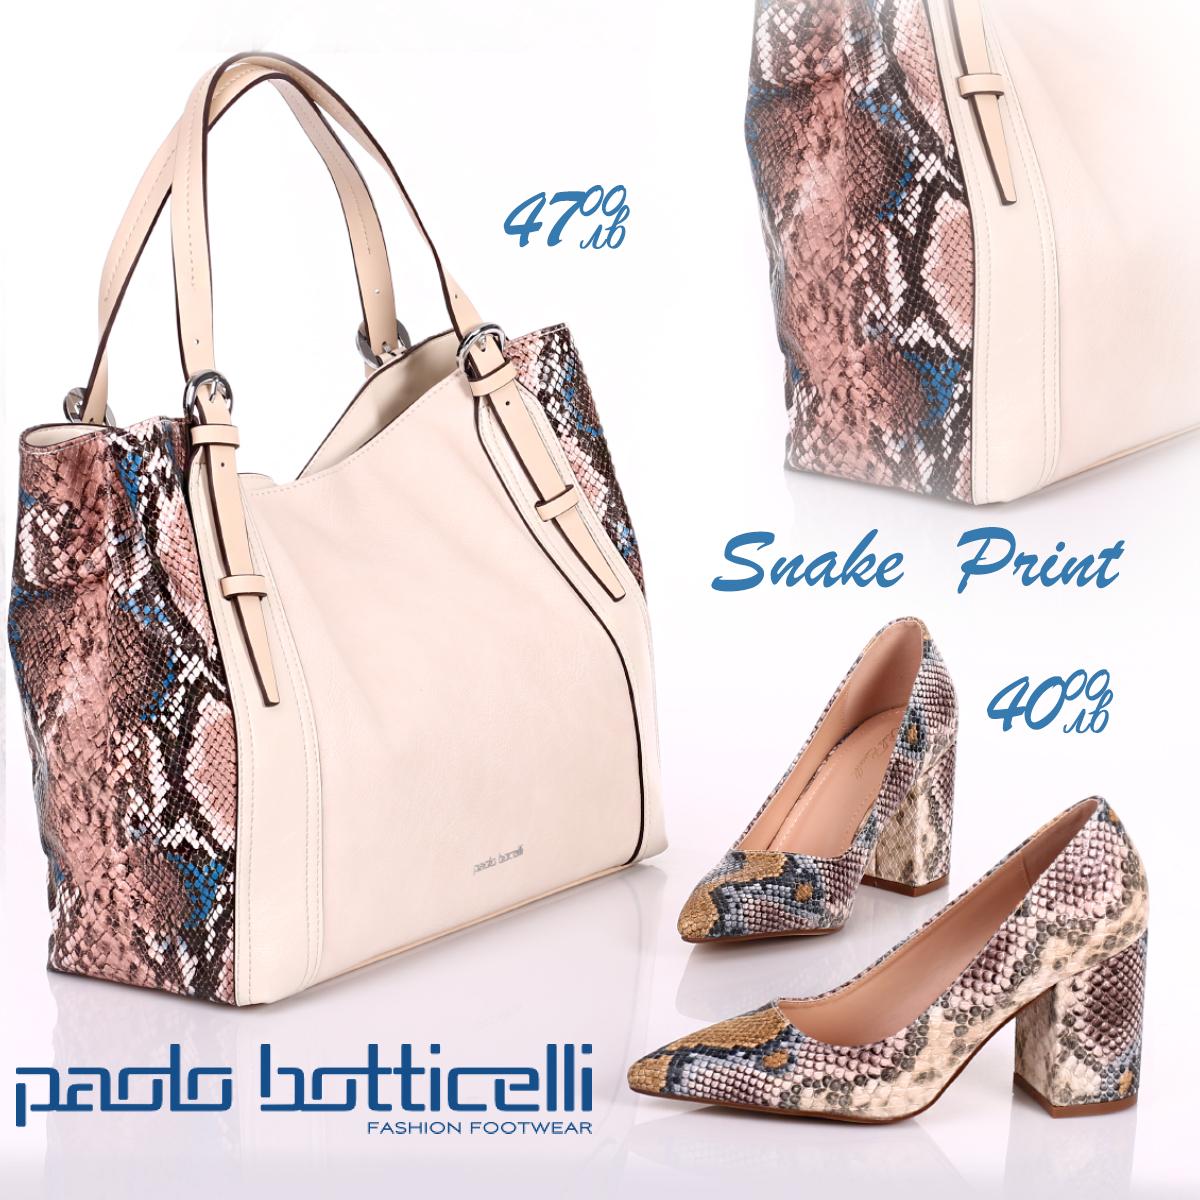 Пролетта пристигна в Paolo Botticelli!